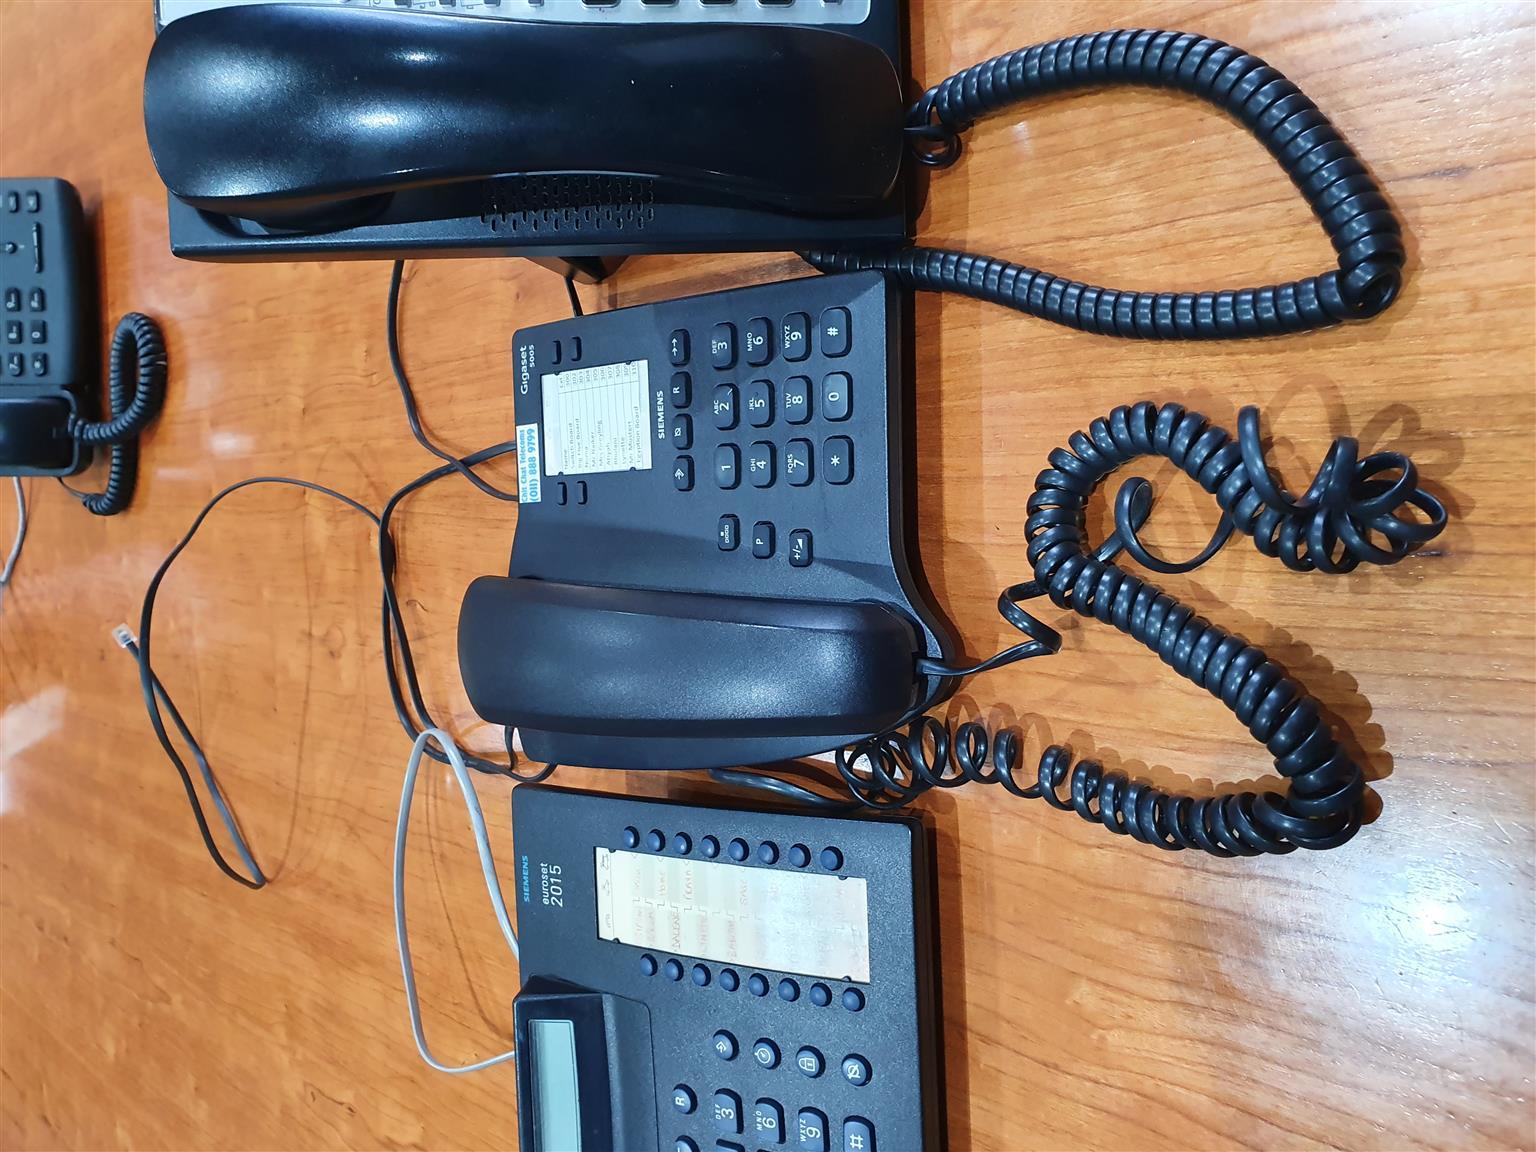 NEC - Telephone system